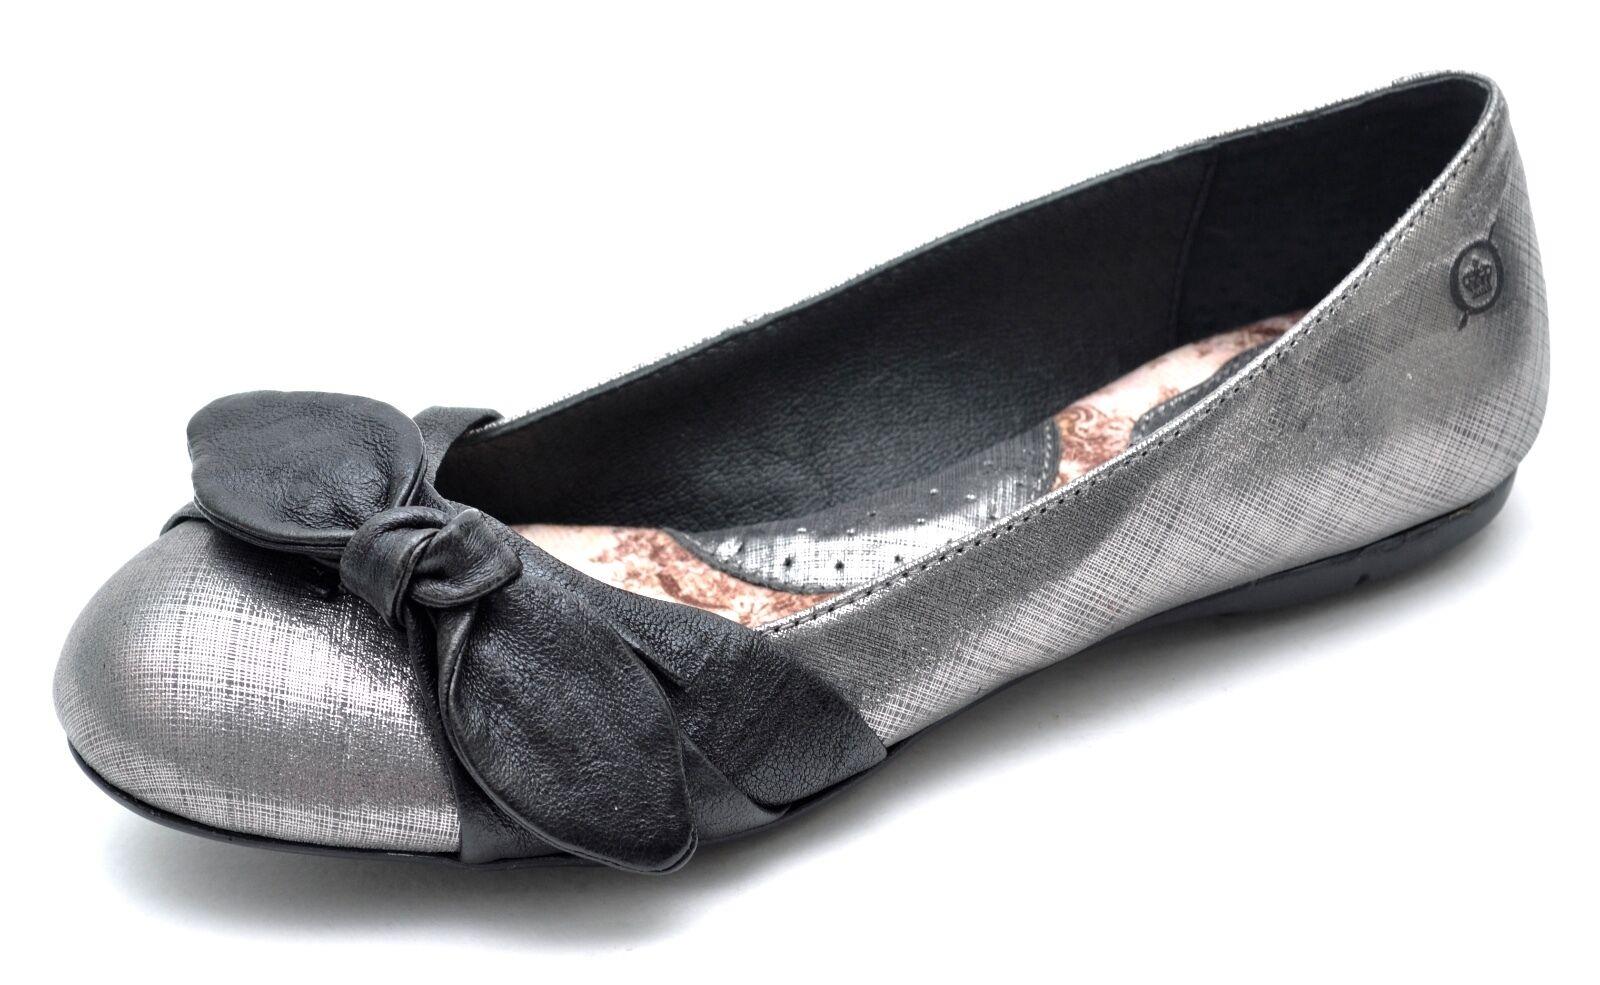 Born MOLLY Metallic Leather Silver Black Ballet Flats Women's 6 - NEW - B59456